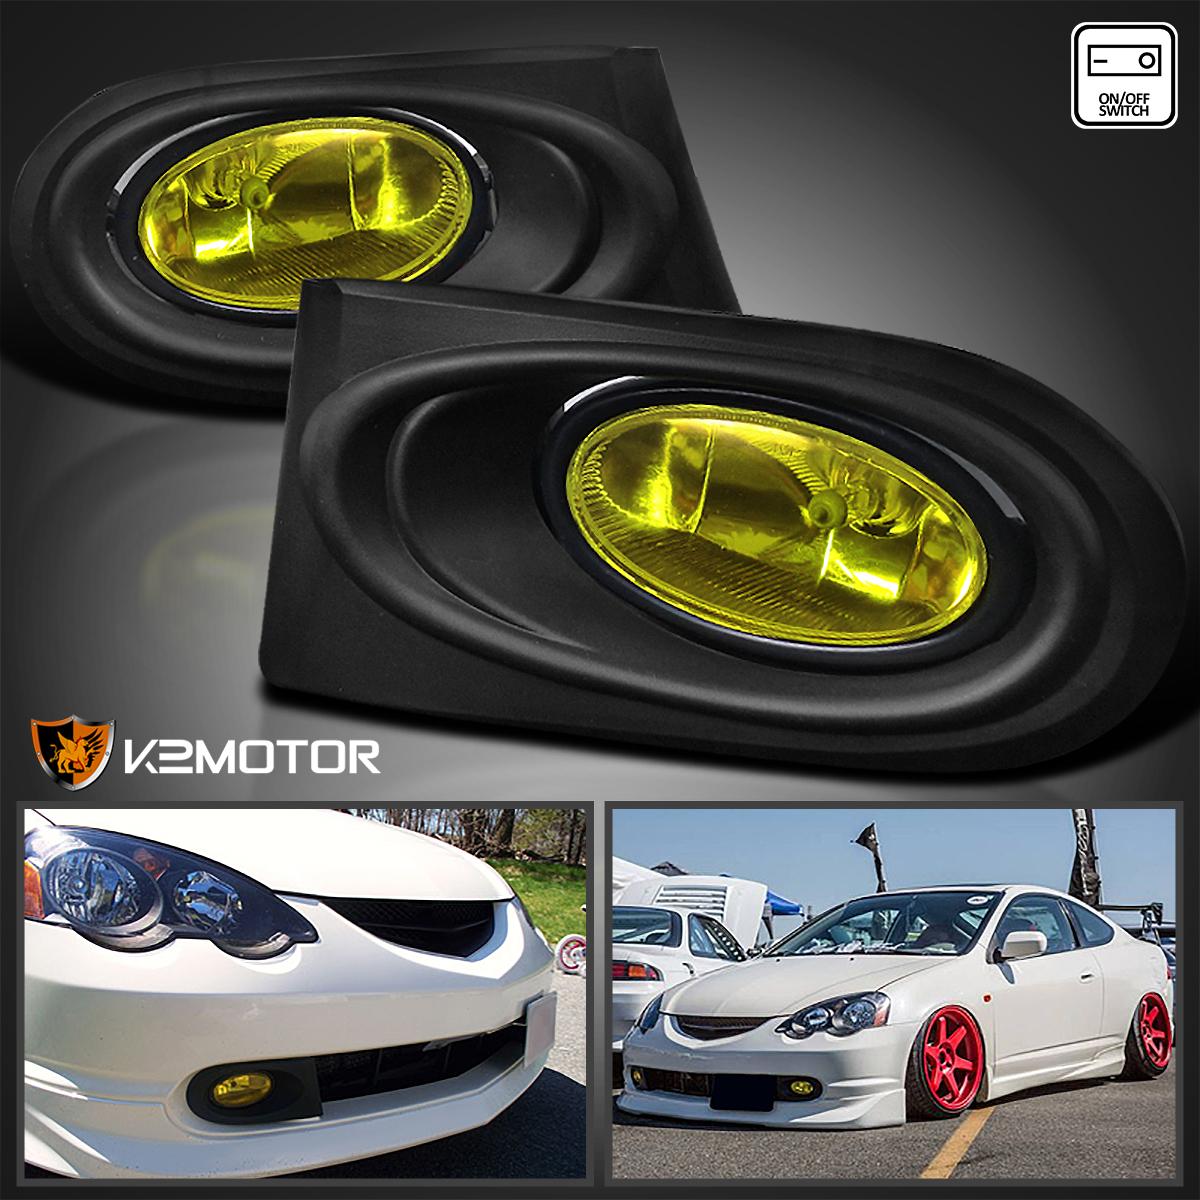 02-04 Acura RSX Black LED Halo Projector Headlights+Yellow